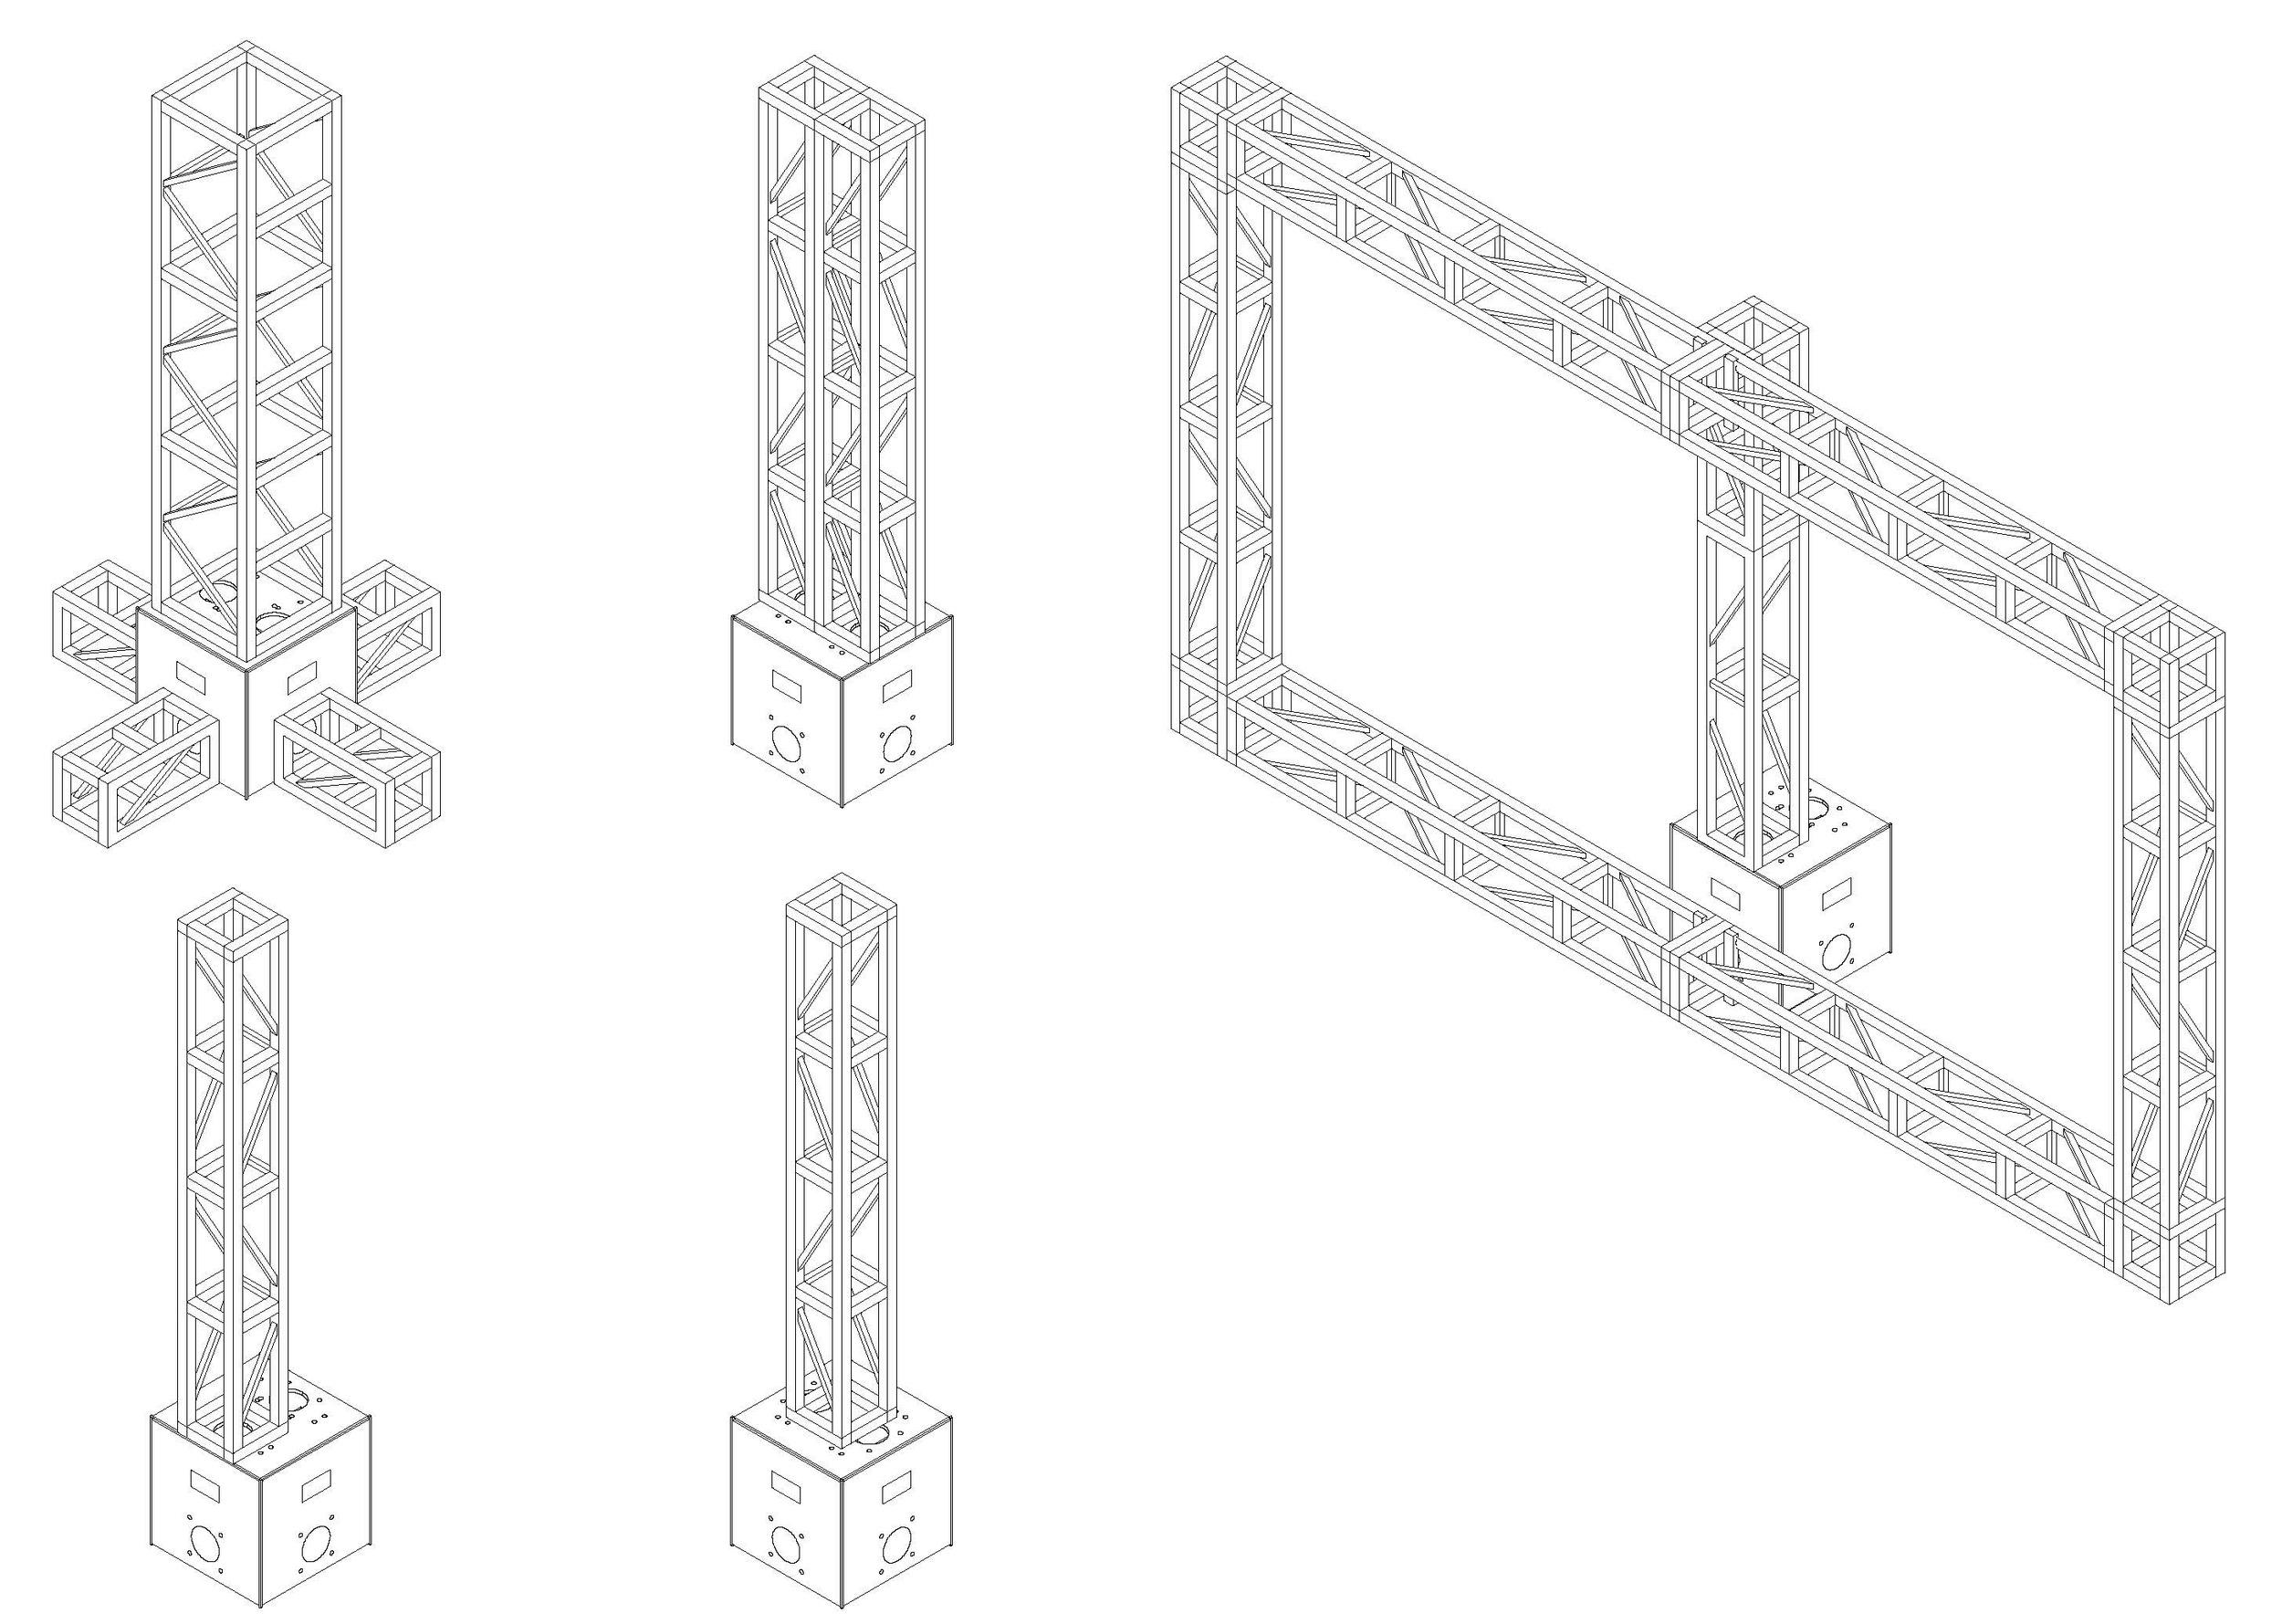 Sampling of Configuration